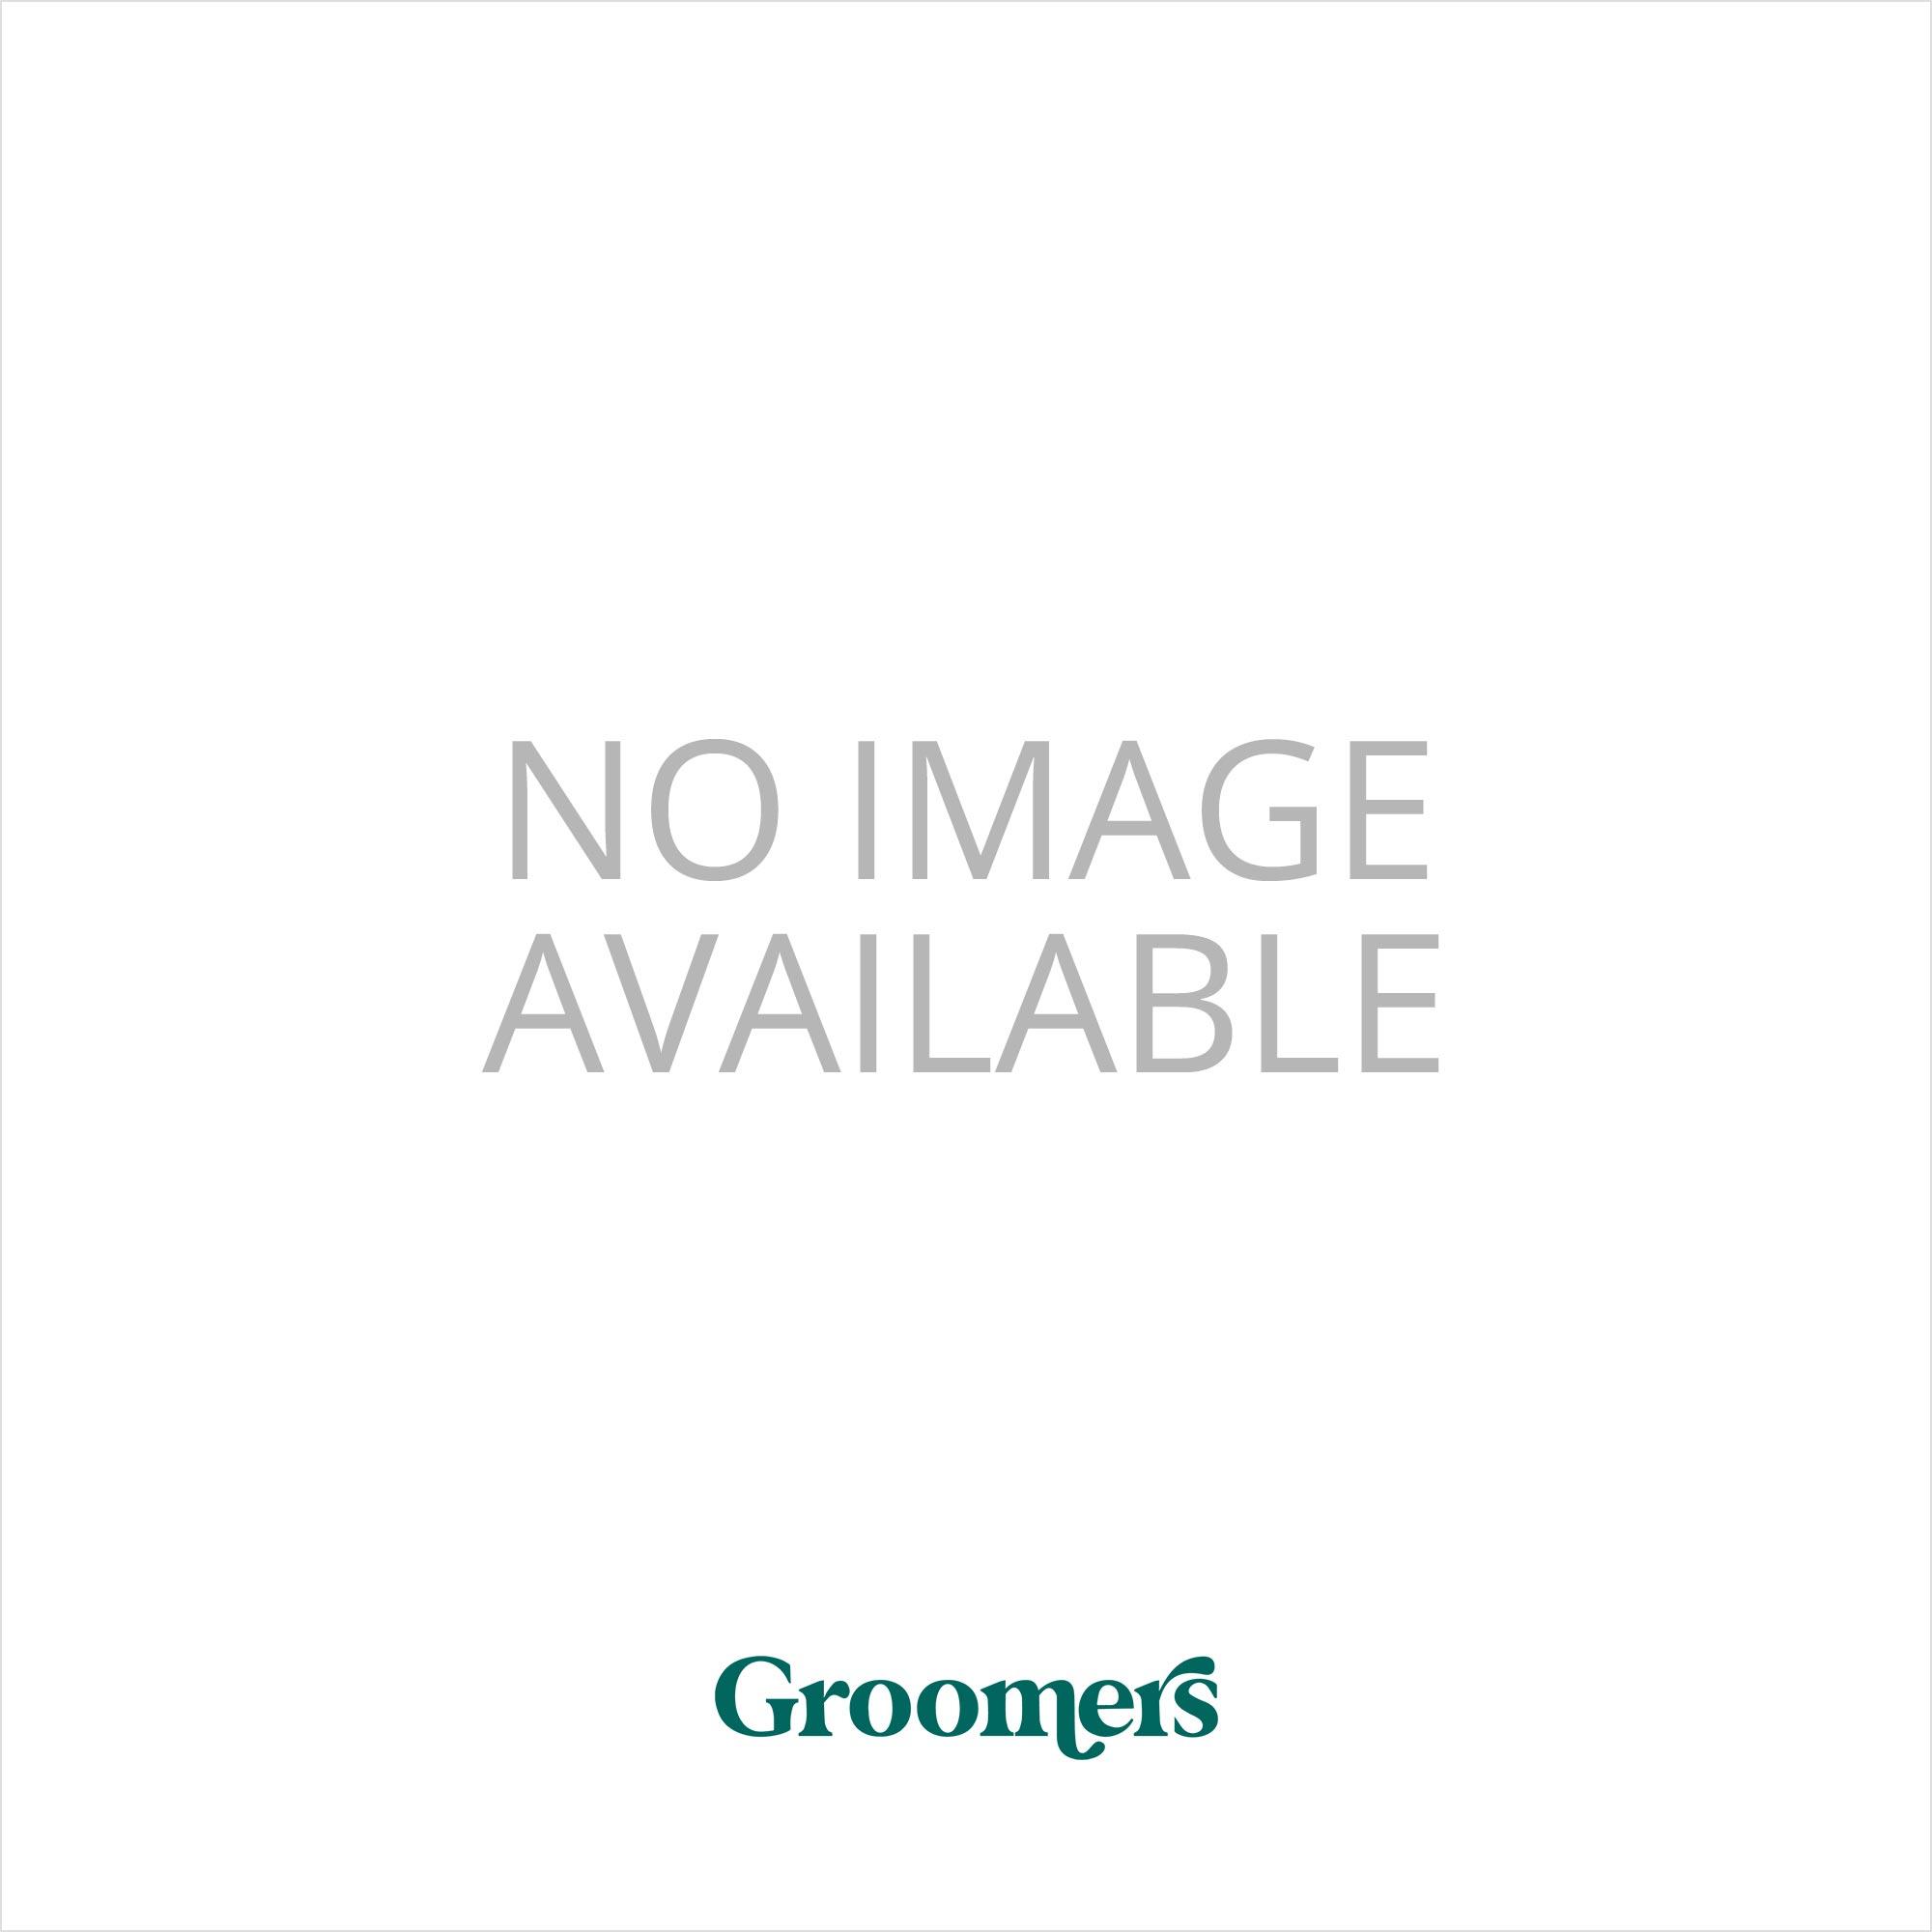 Groomers Simply Naturals Jasmine and Lemongrass Shampoo - Retail